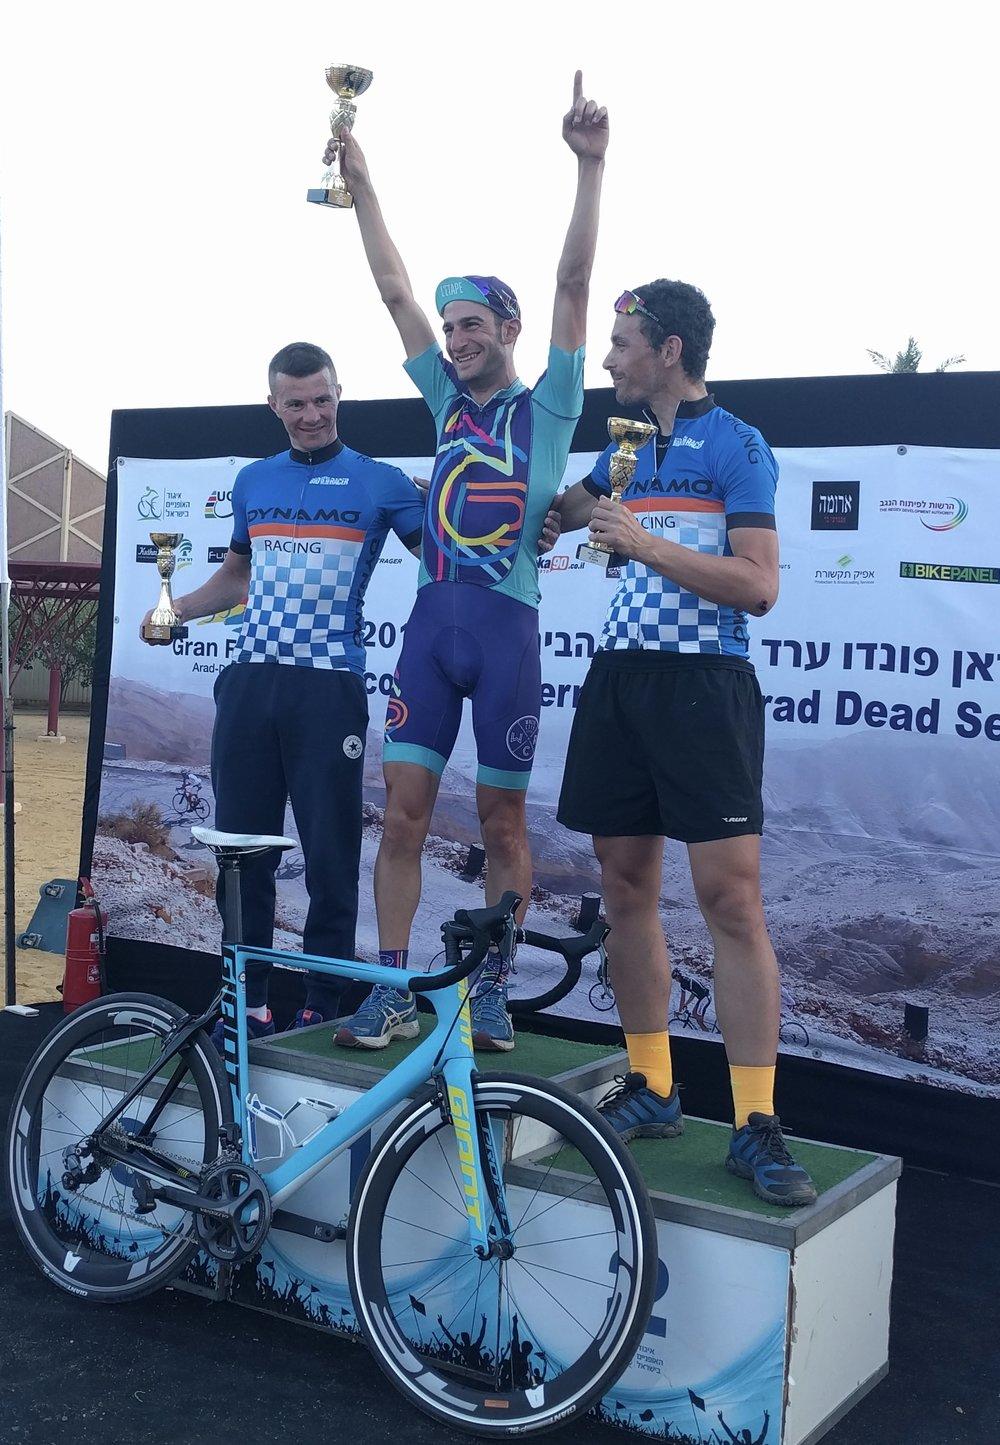 International Athlete Alon L. Winner, 2016 Tour of Arrad, a 3-day International Stage race